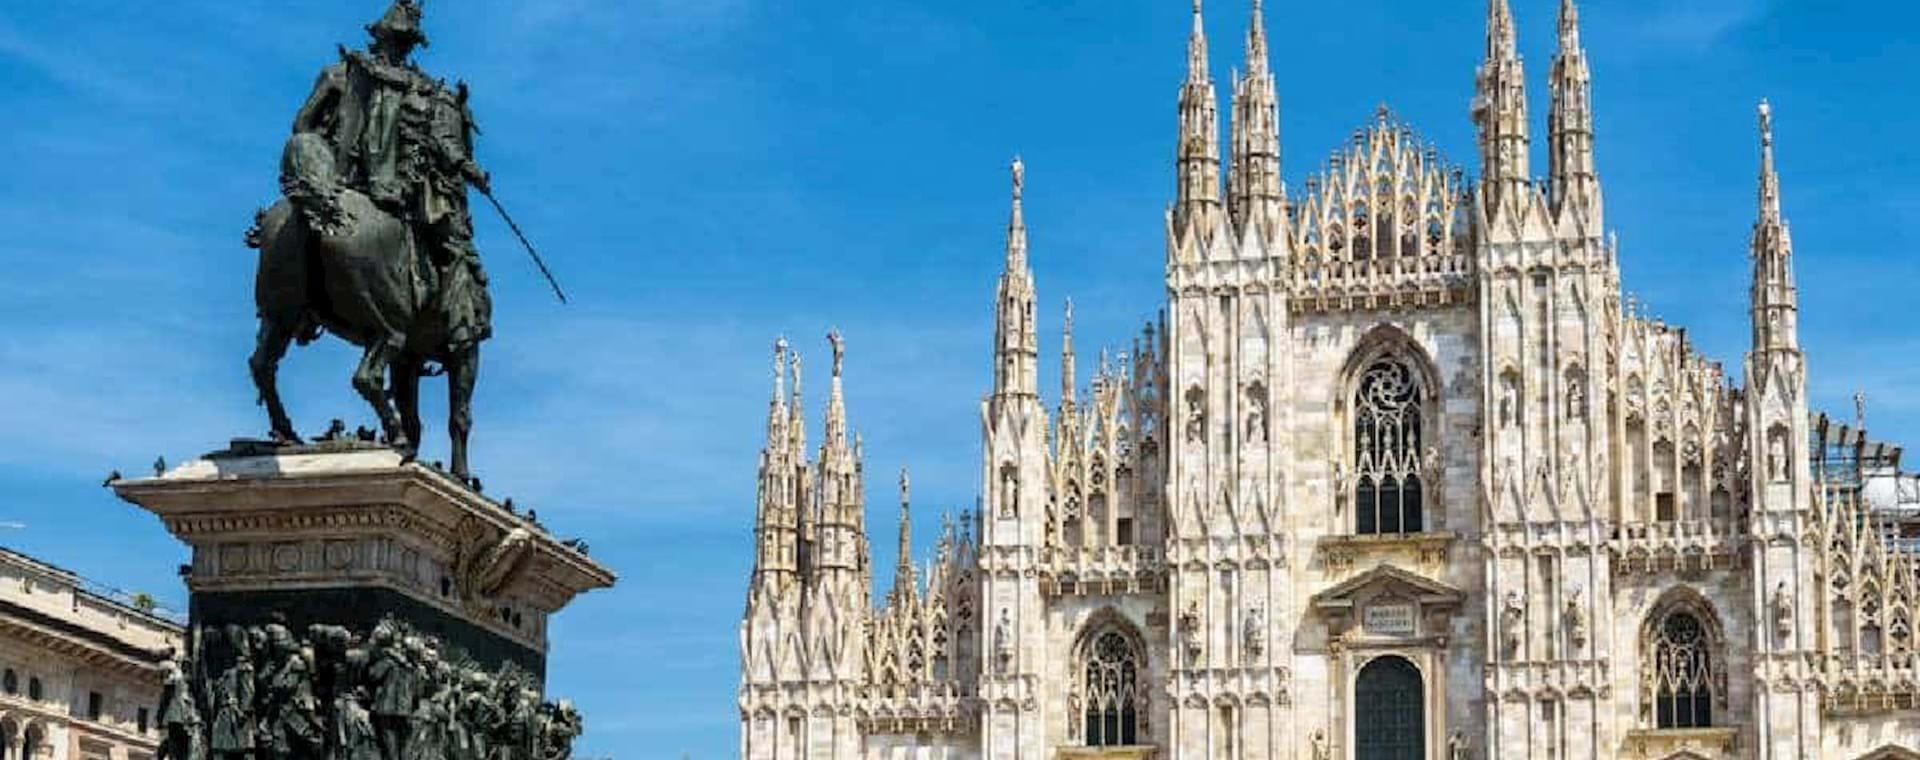 Piazza Duomo in Milan